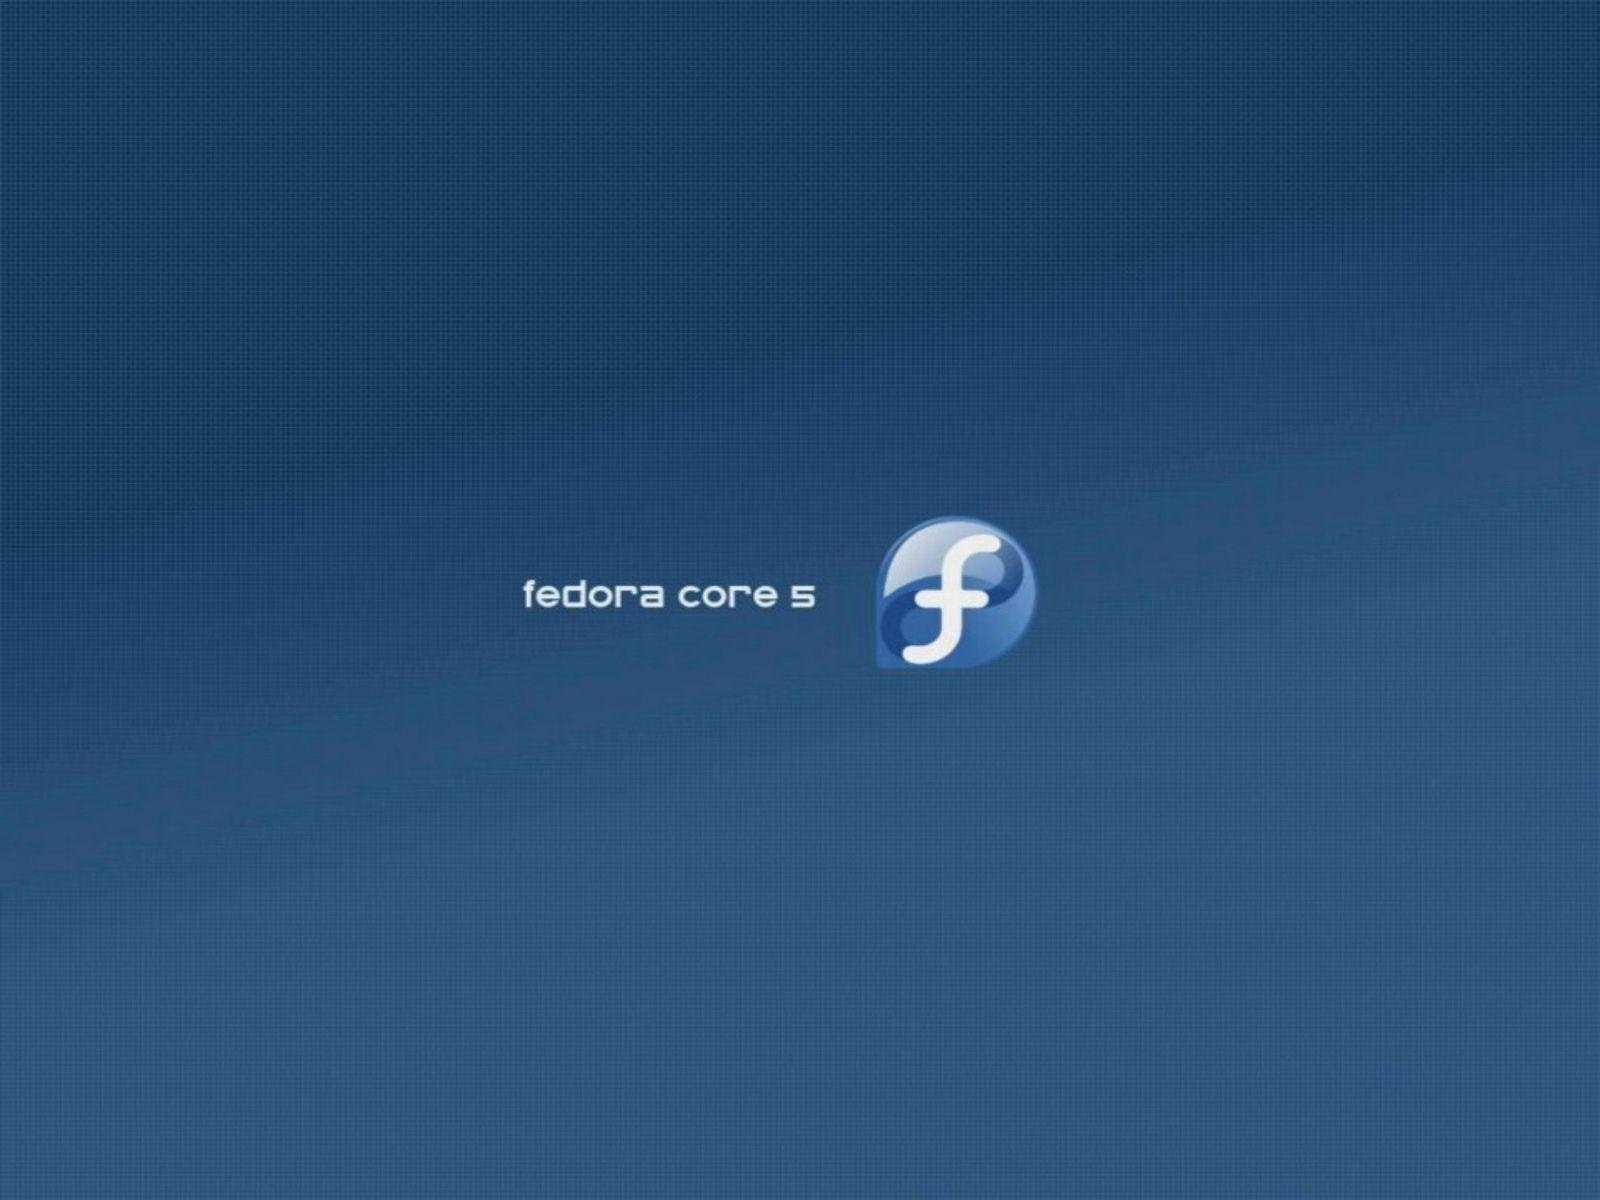 linux fedora wallpaper - photo #1